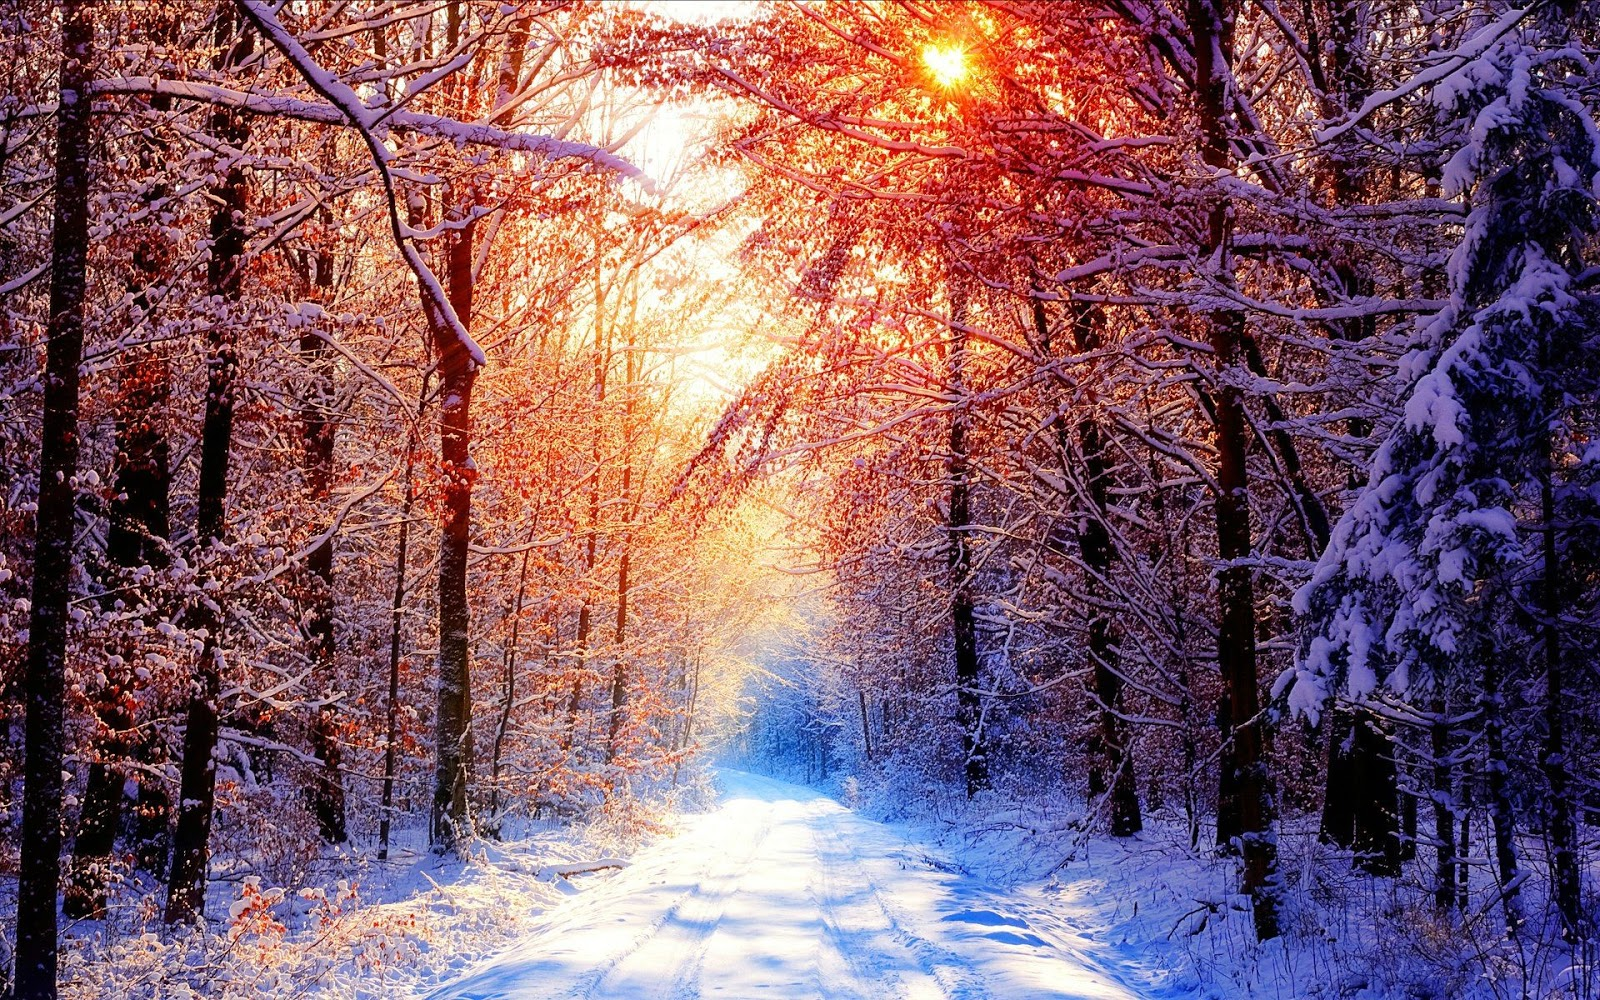 Best 52 Snowfall Wallpapers Fashionwtf Warm Winter 478458 Hd Wallpaper Backgrounds Download